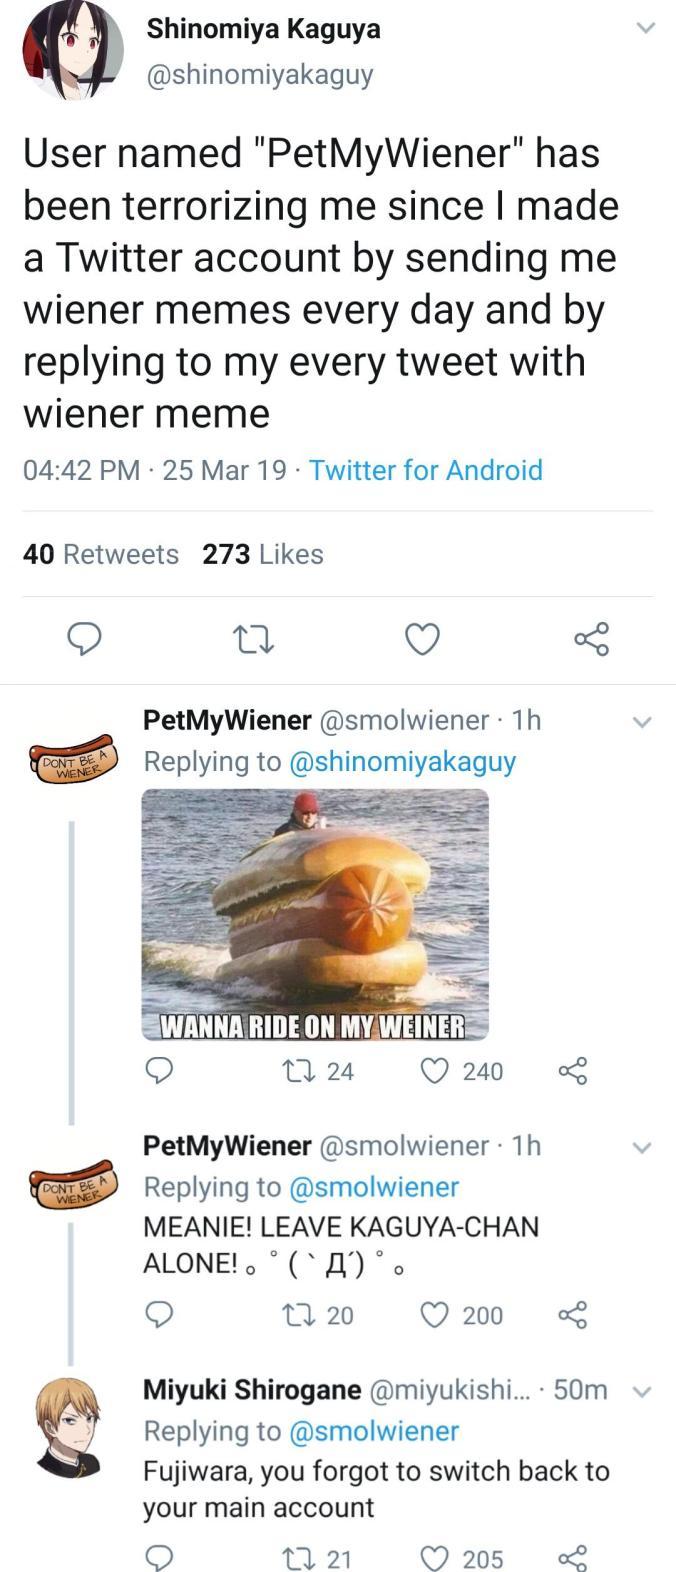 BIG JUICY WIENER (Long meme. Open the image)